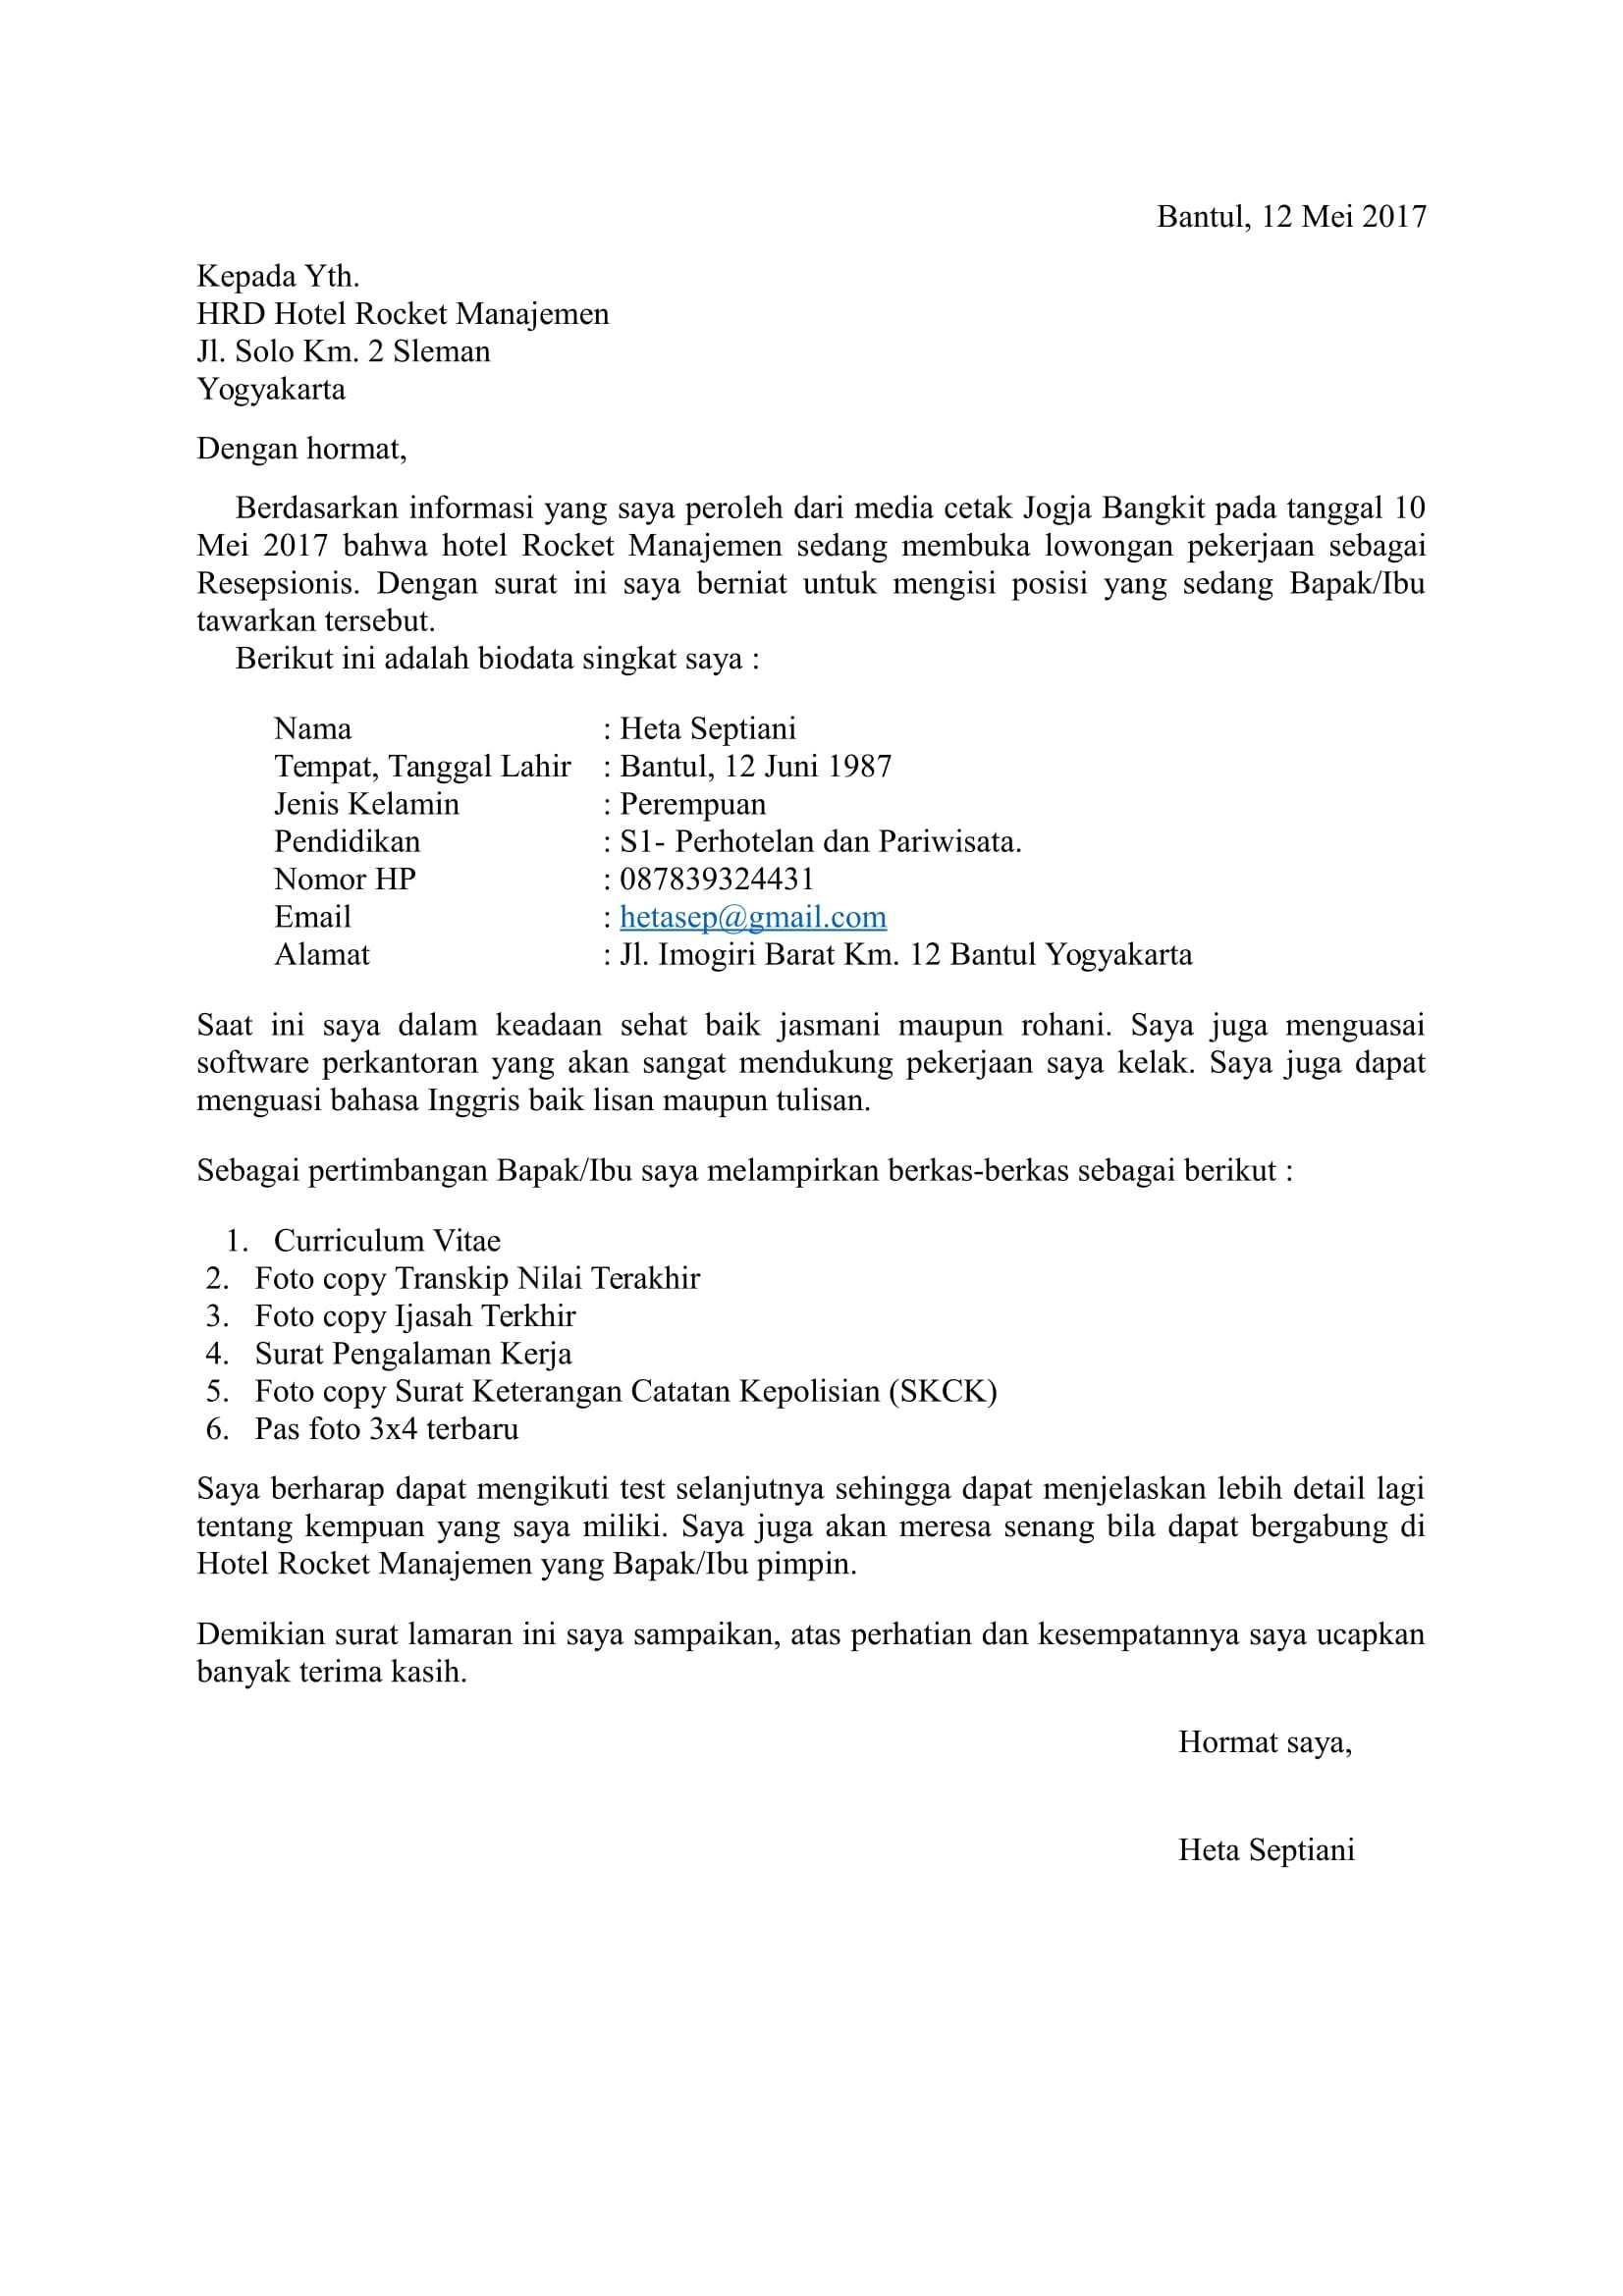 5 Contoh Surat Lamaran Kerja Yang Baik Dan Benar Langsung Di Acc